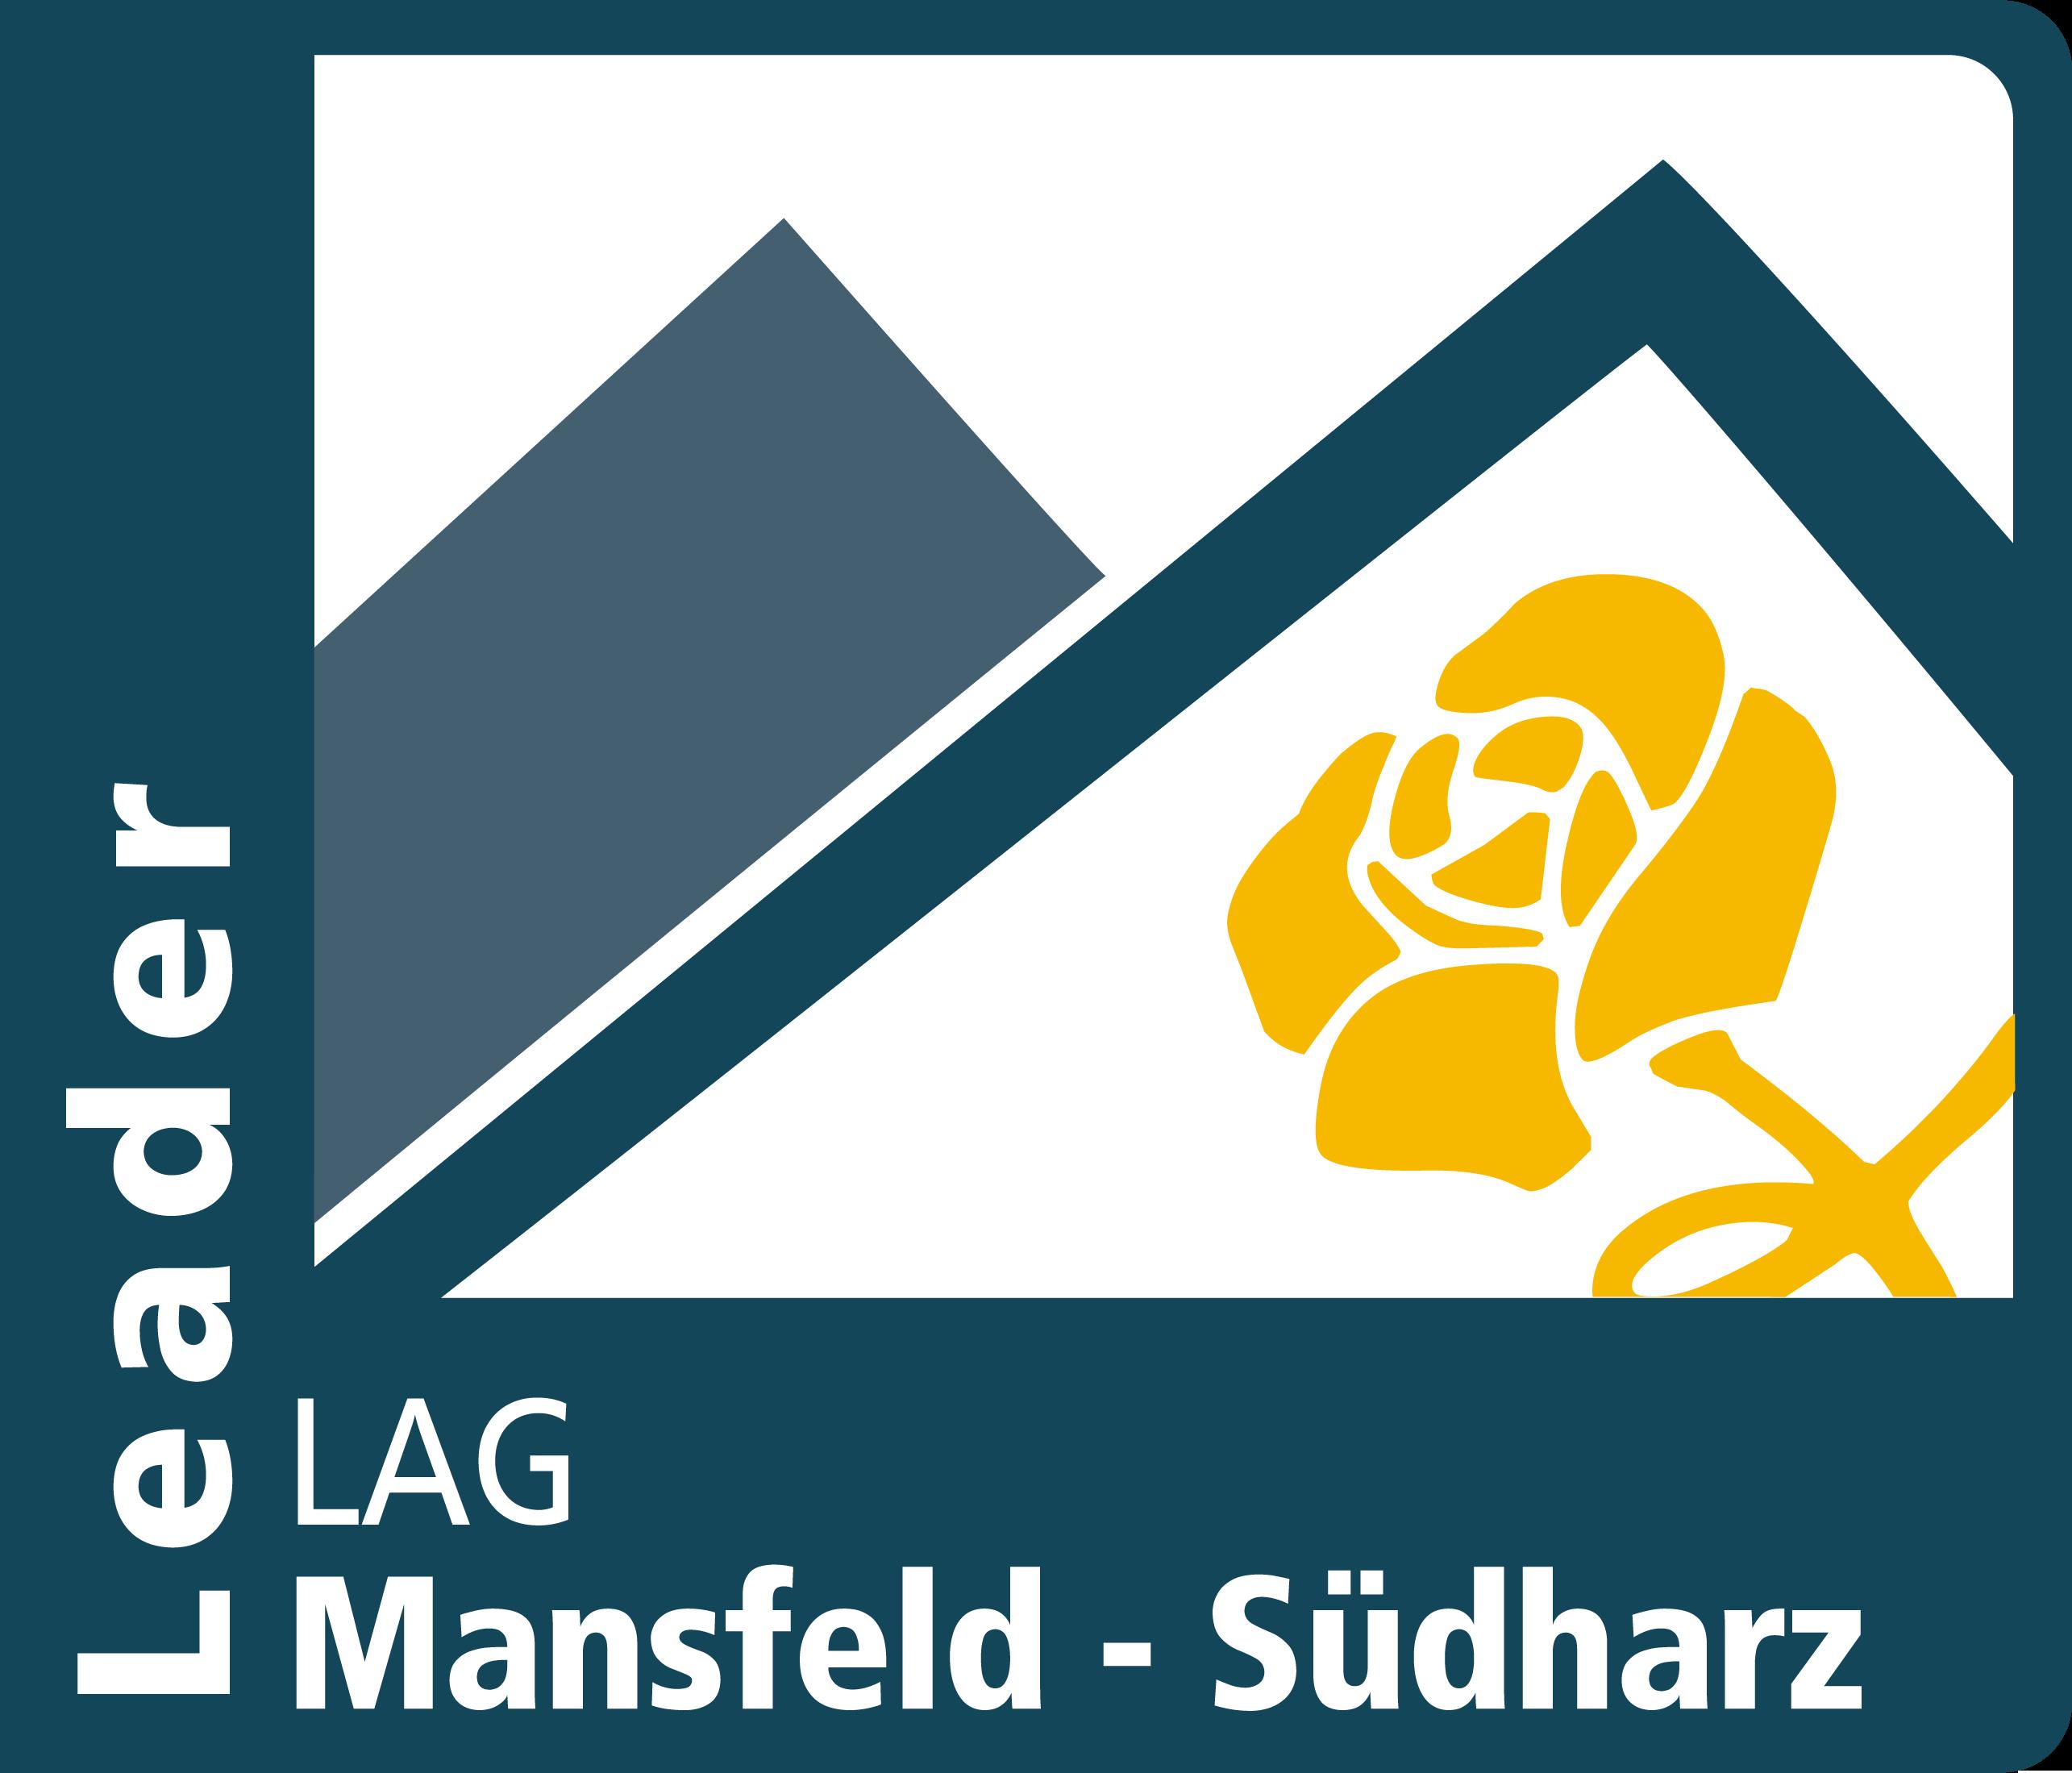 Logo der LAG Mansfeld-Südharz